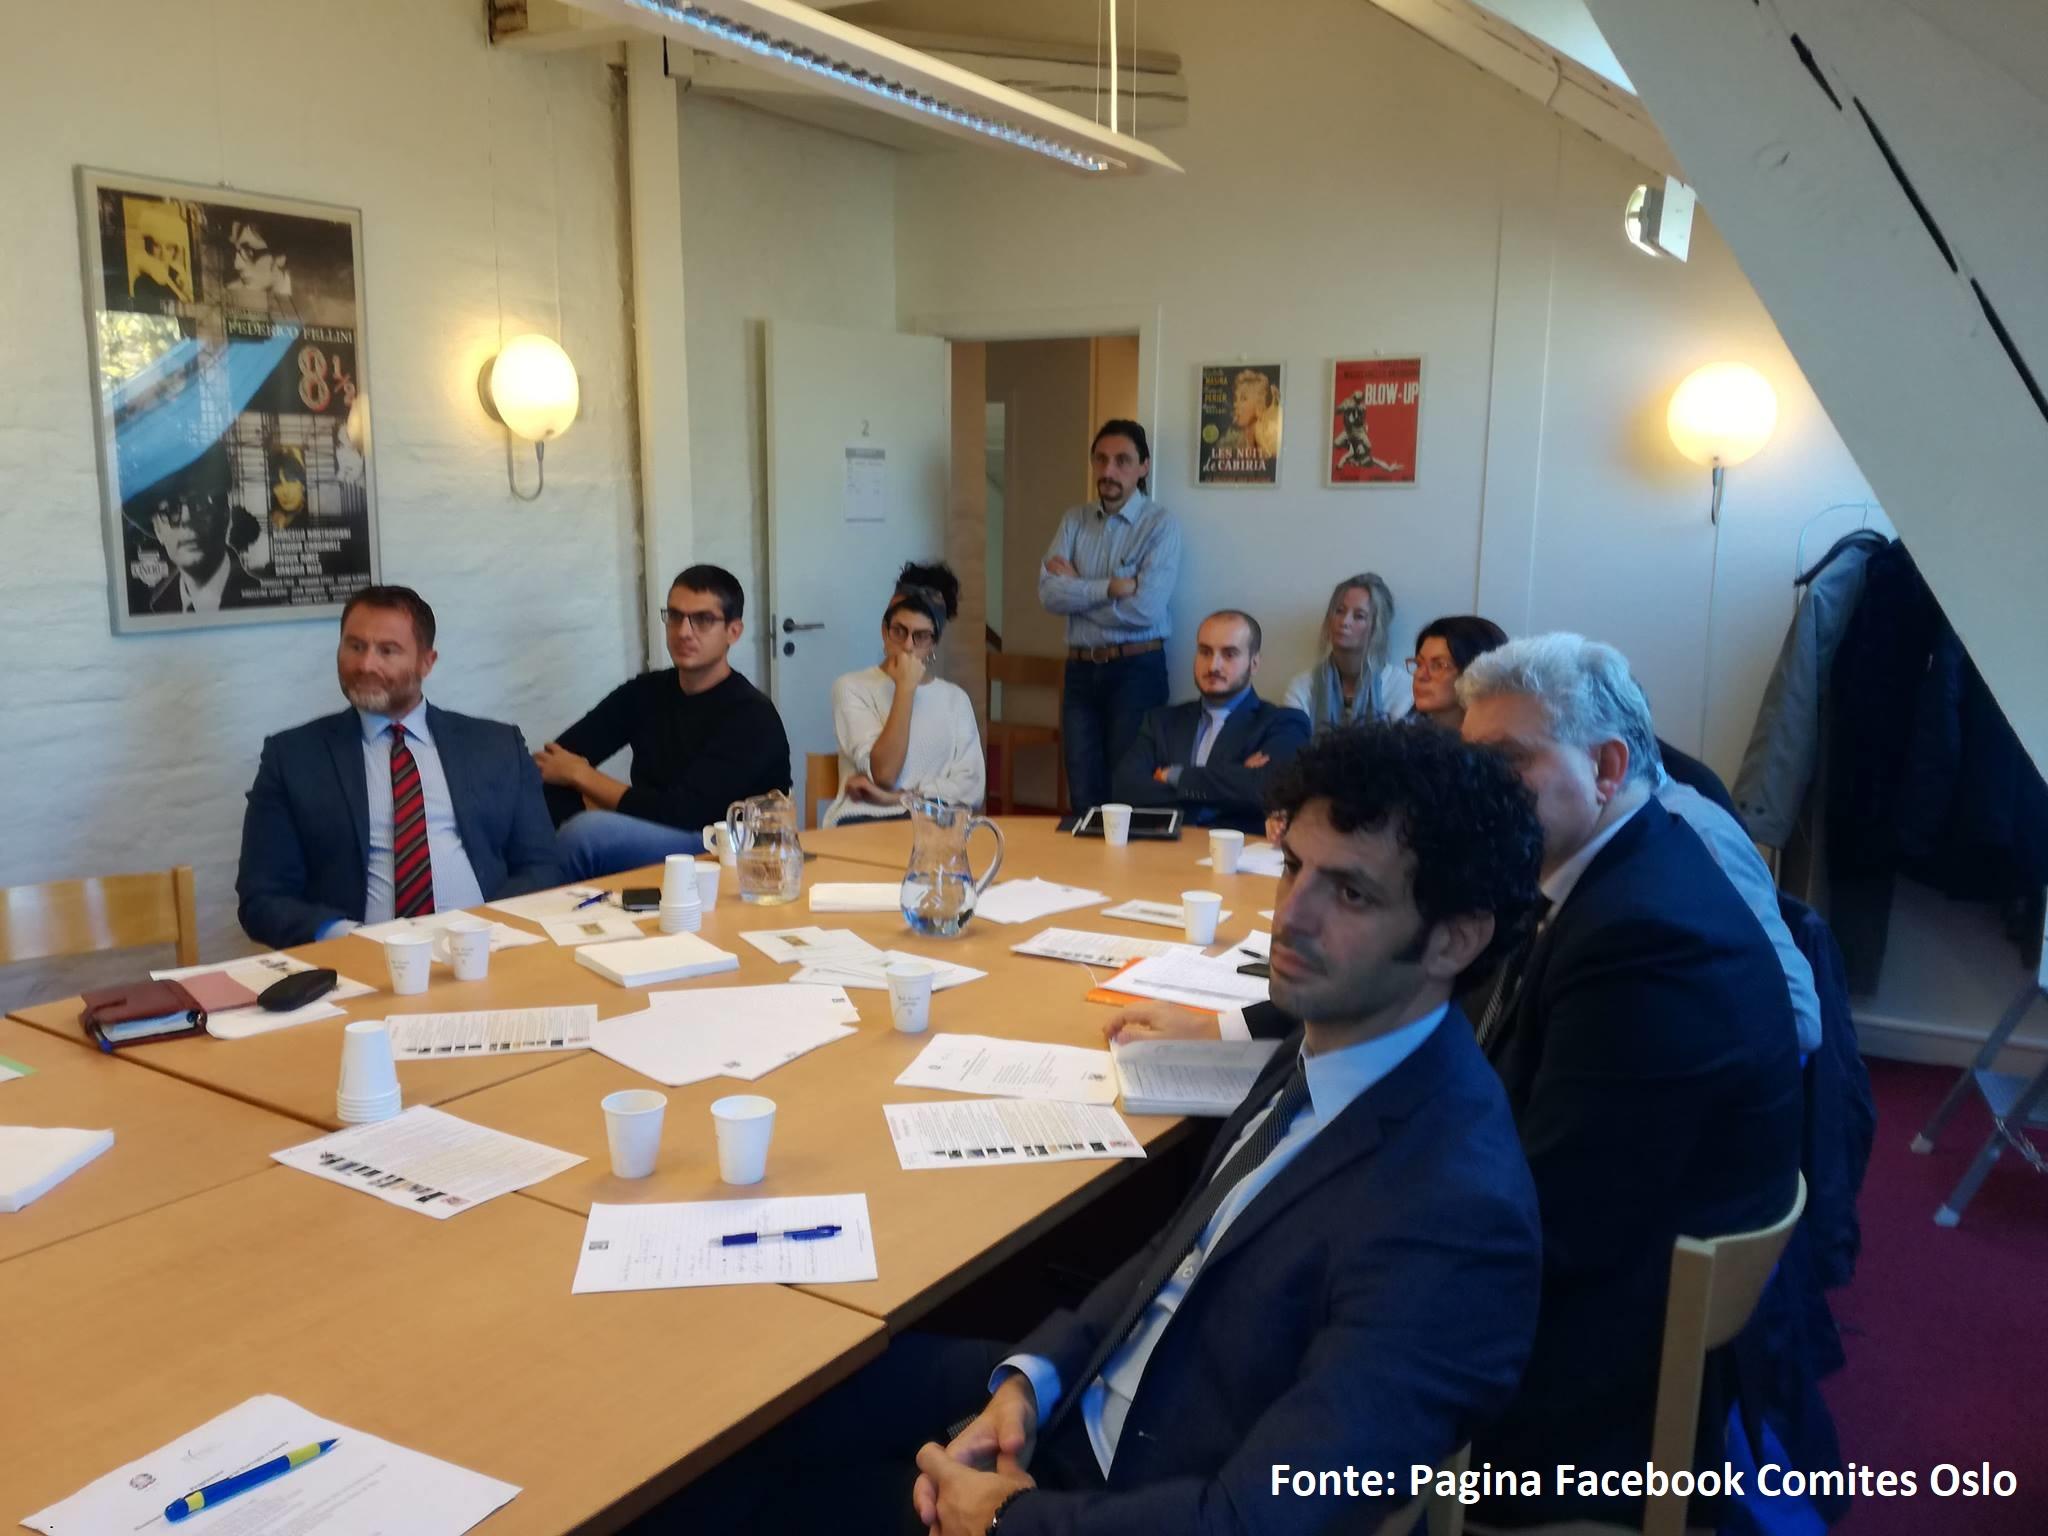 Incontro Sistema Italia con l'Ambasciata d'Italia a Oslo